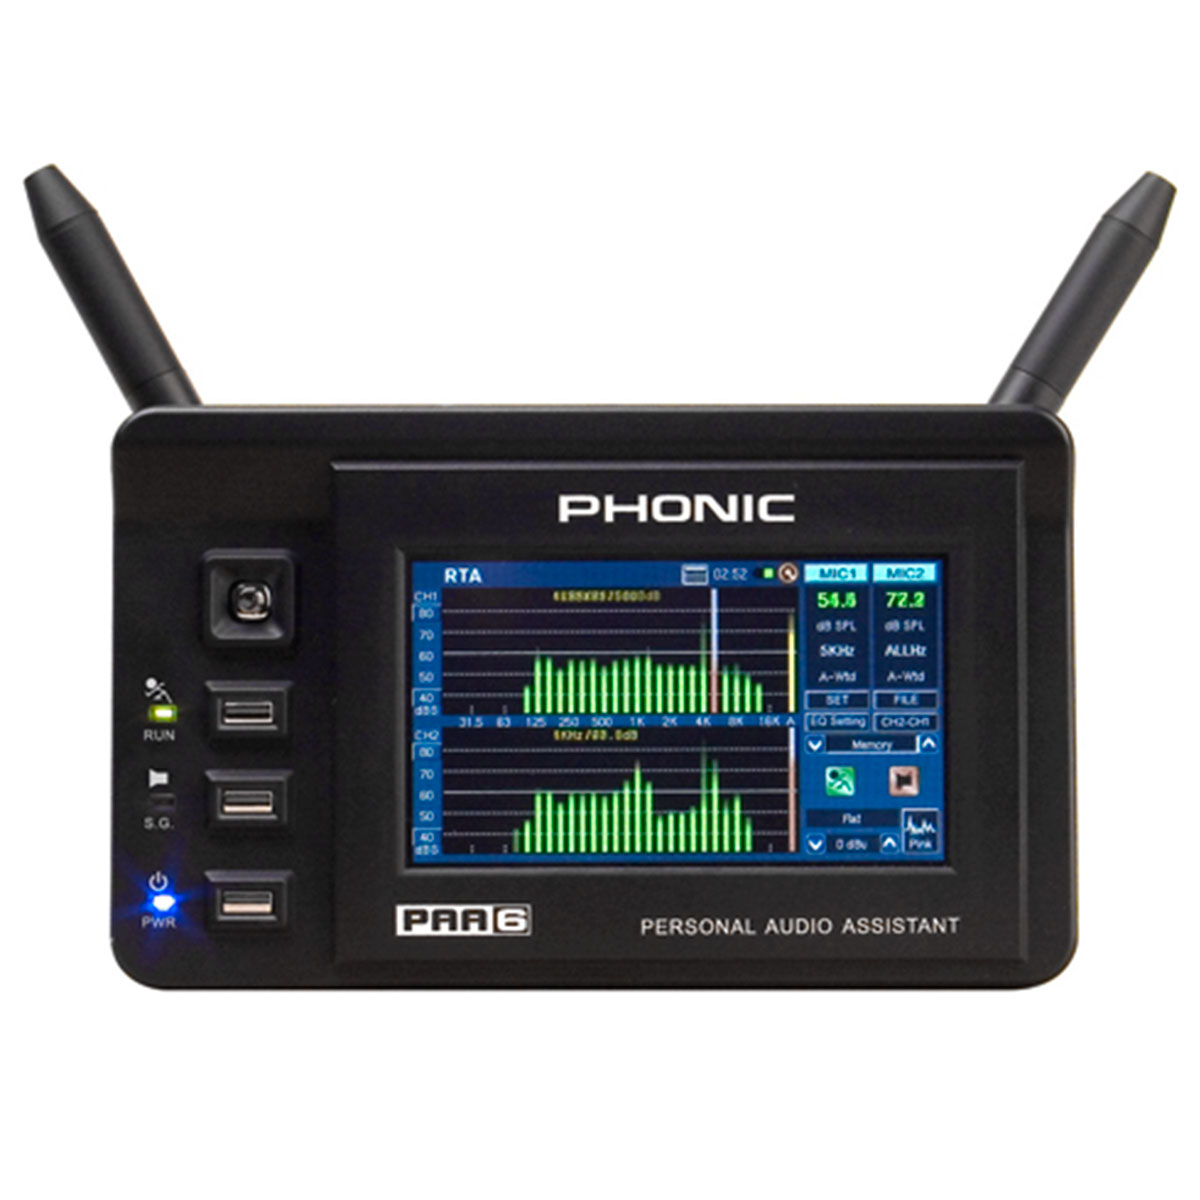 PAA6 - Analisador de Áudio 2 Canais c/ USB PAA 6 - Phonic